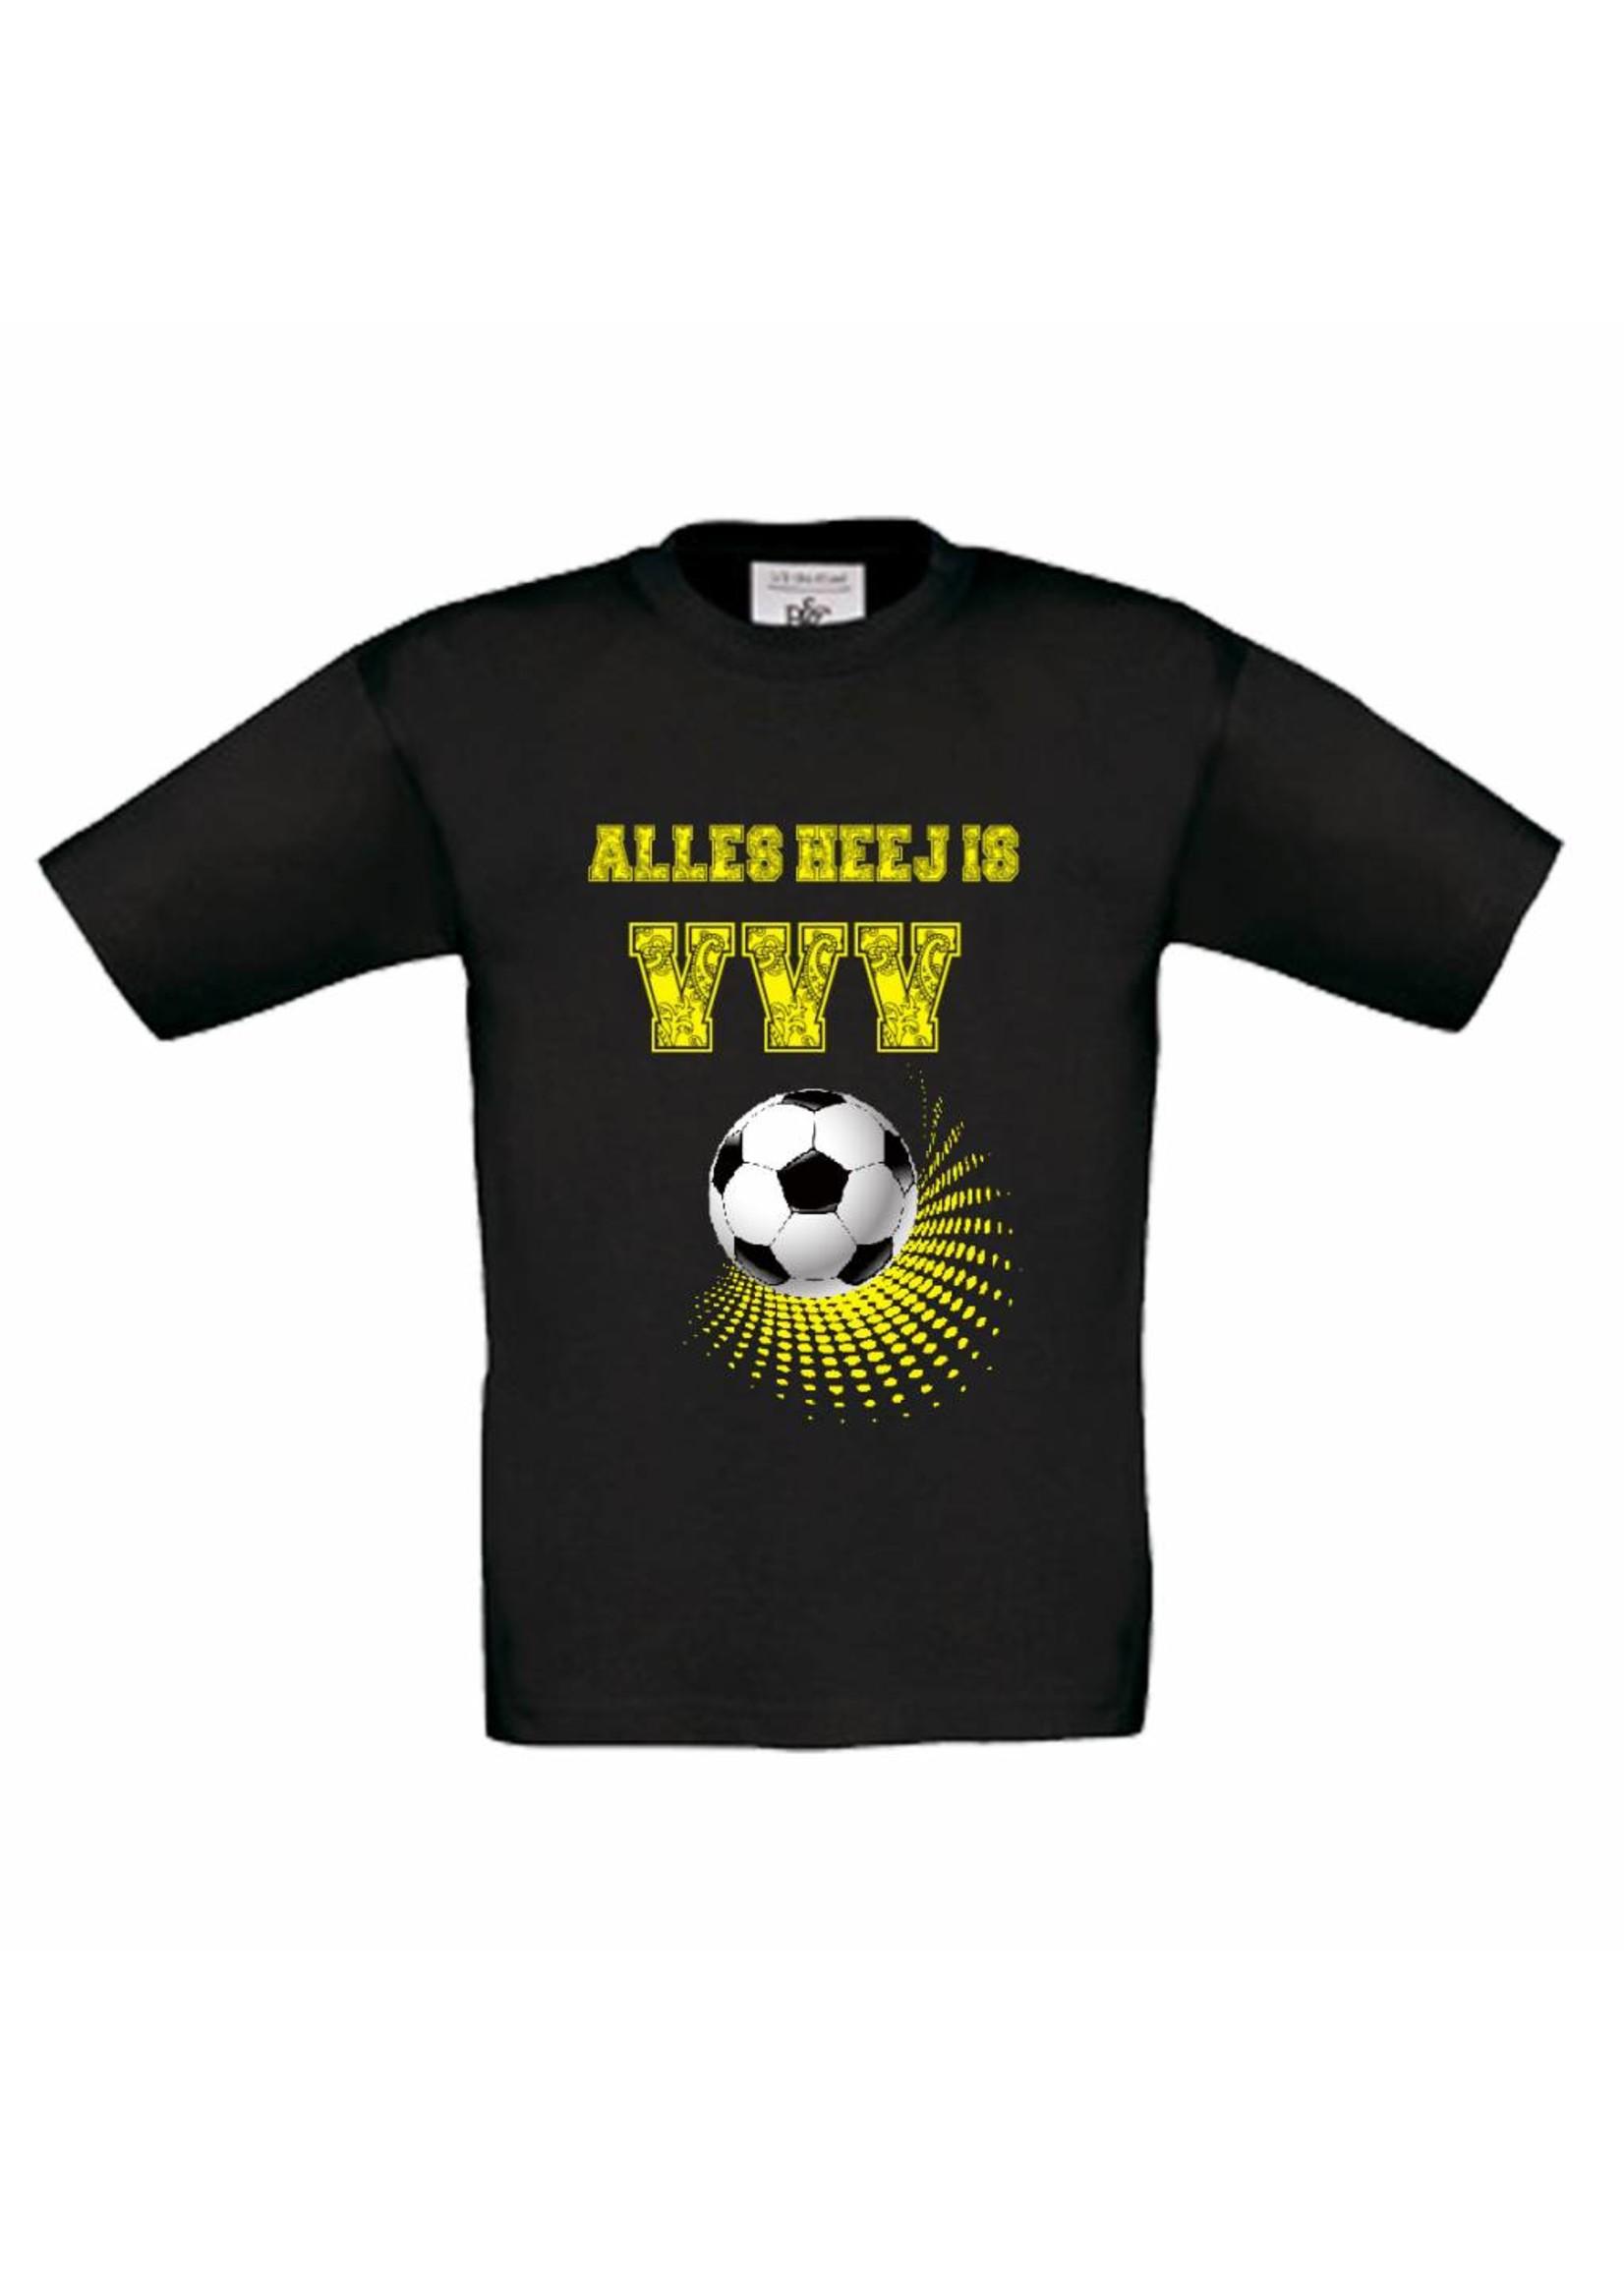 T-shirt Alles heej is VVV